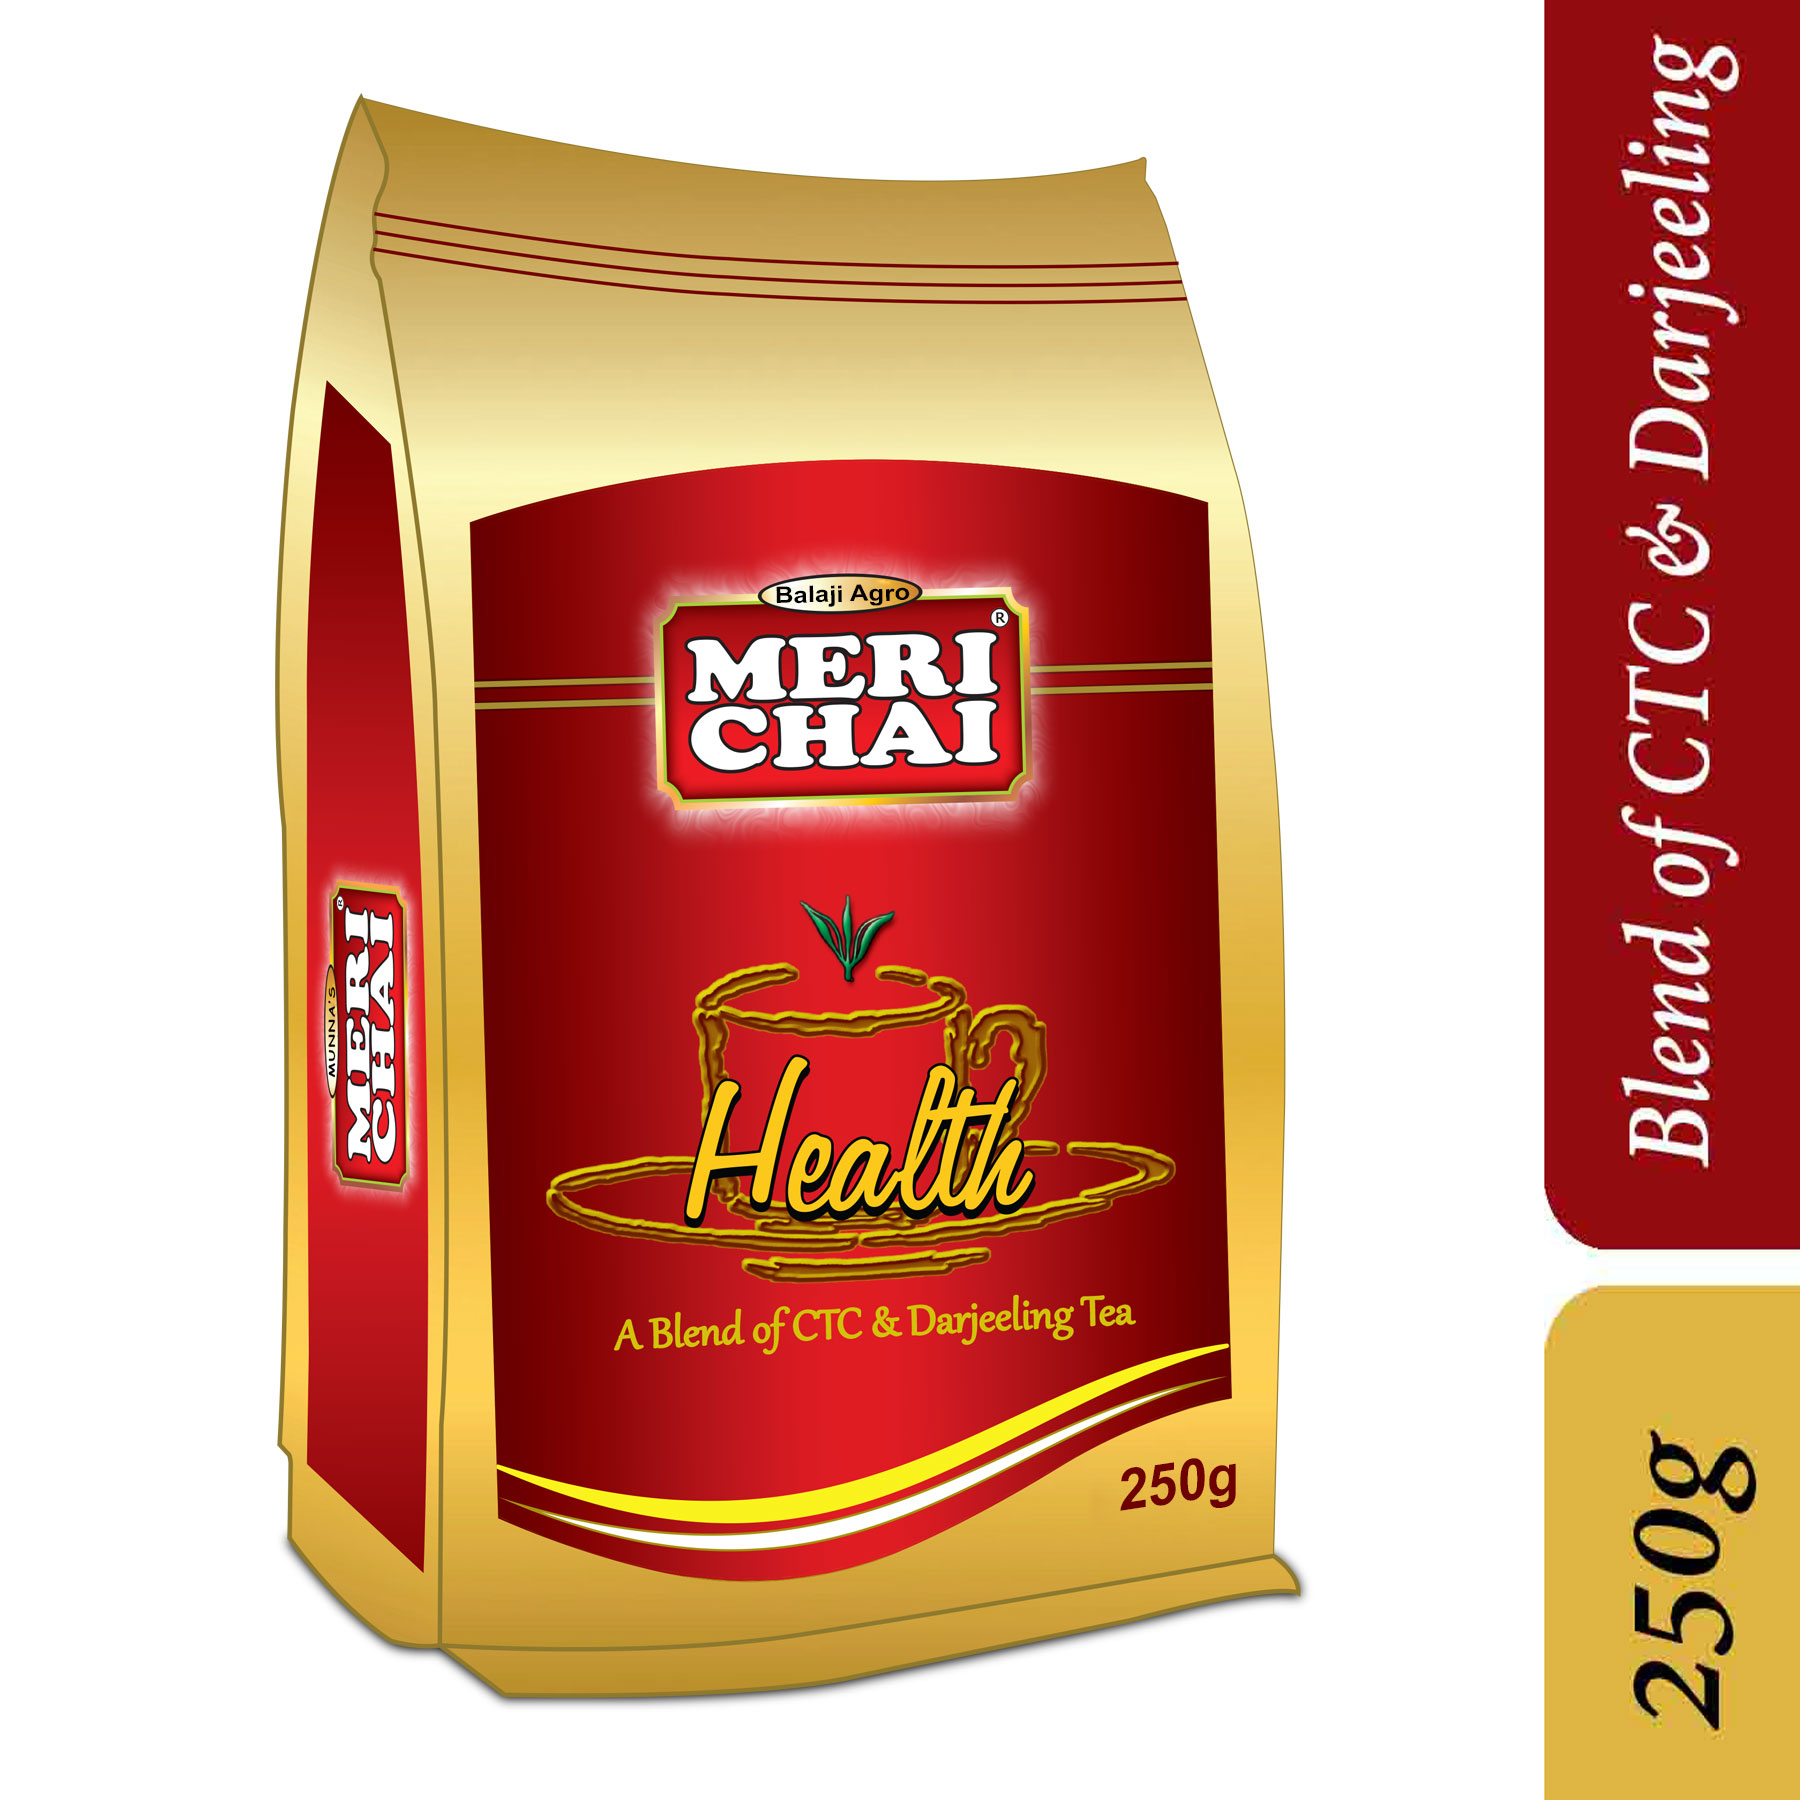 MERI CHAI Health Premium Tea